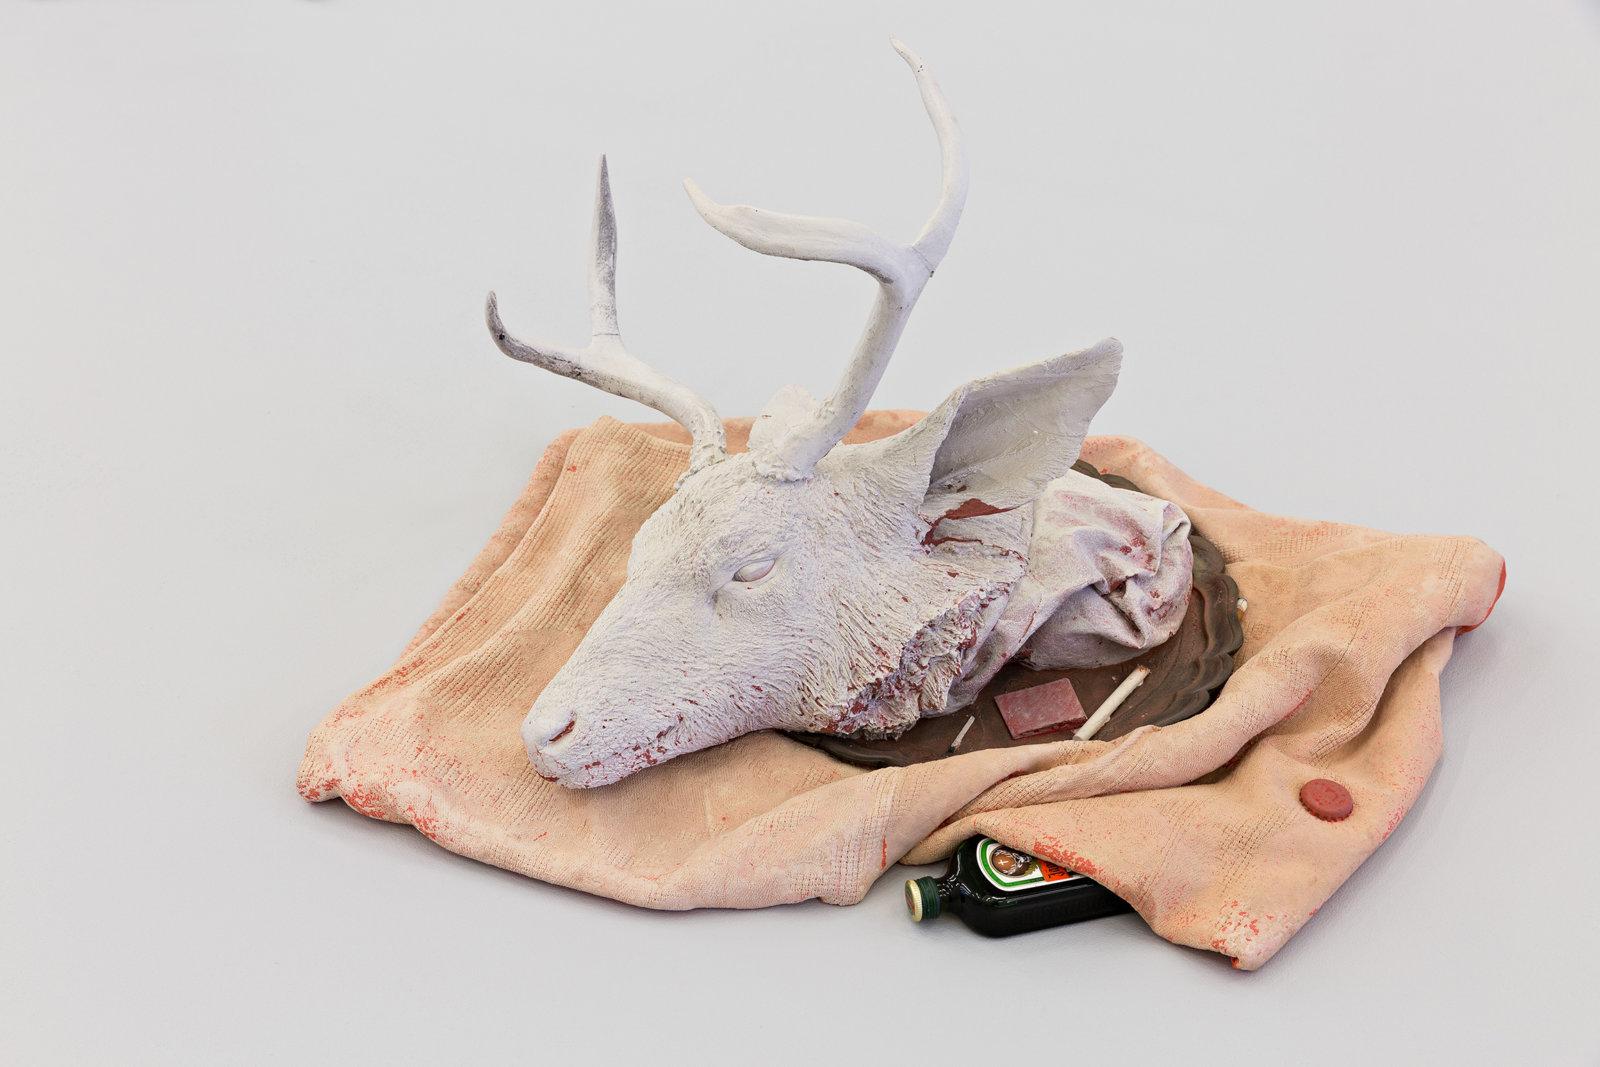 Liz Magor, Buck (Jagermeister), 2008, polymerized gypsum, liquor, 16 x 30 x 26 in. (41 x 76 x 66 cm) by Liz Magor